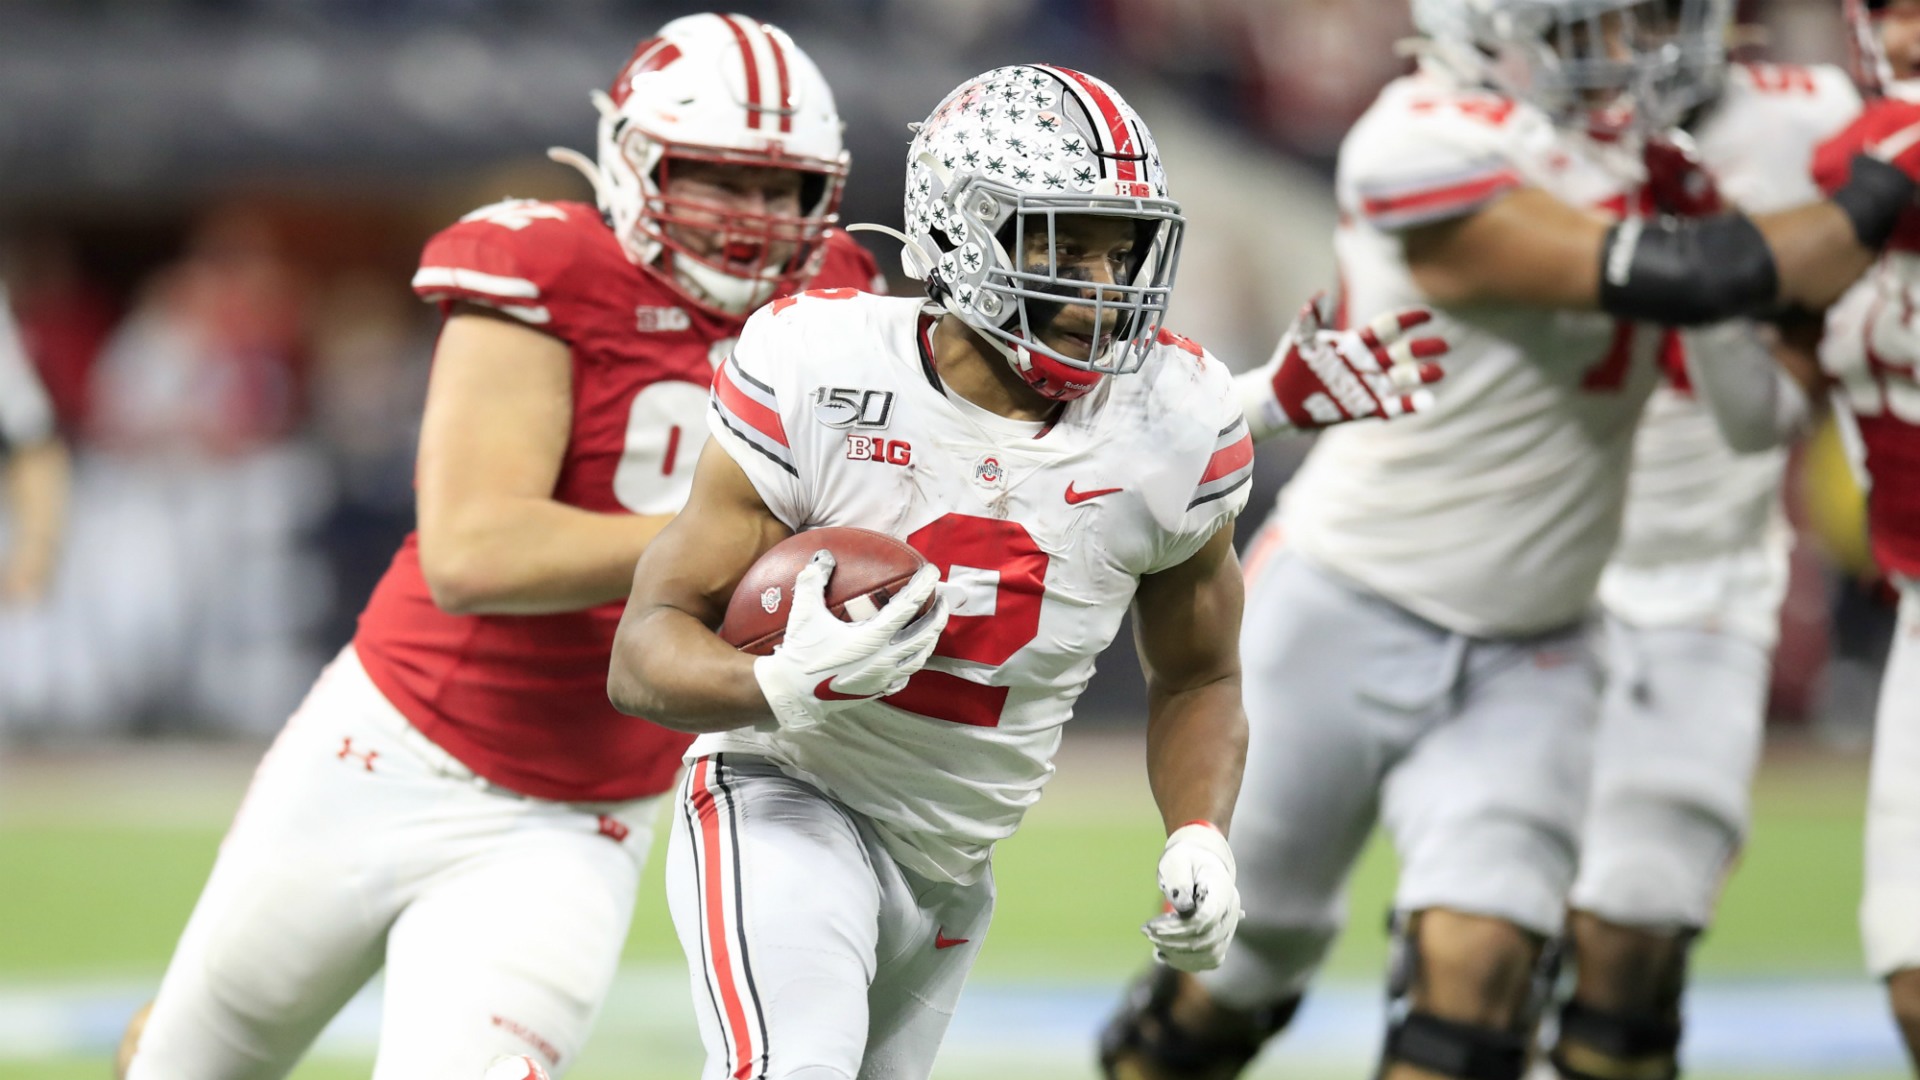 Ohio State vs. Wisconsin final score: Dominant second half fuels Buckeyes' comeback win in Big Ten championship | Sporting News